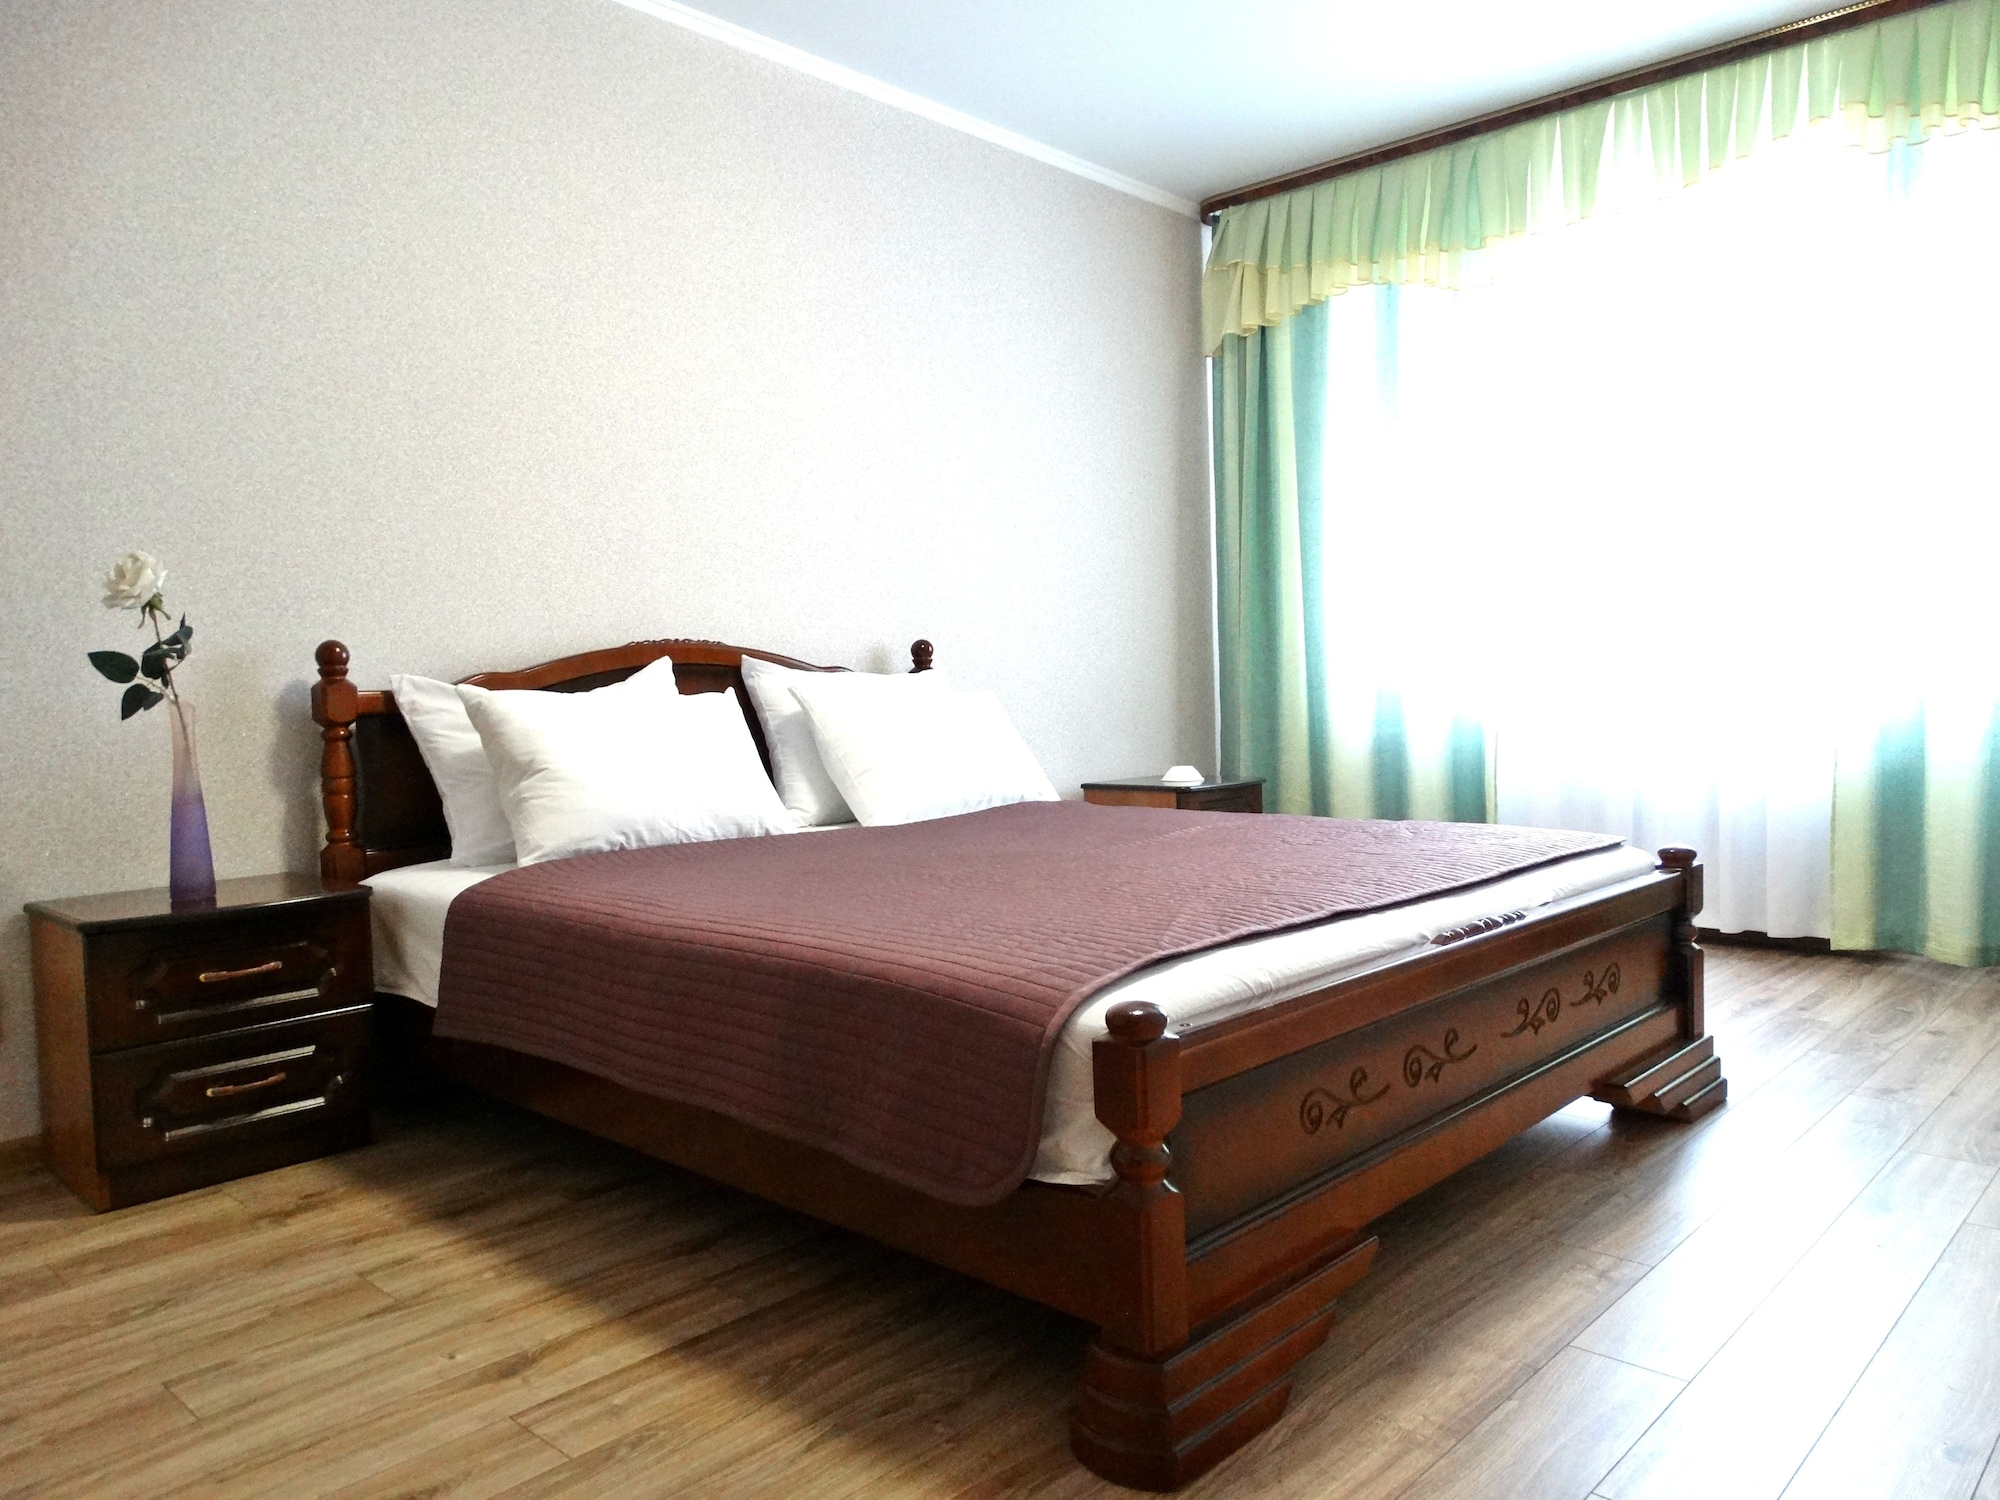 InnDays Apartments, Tula